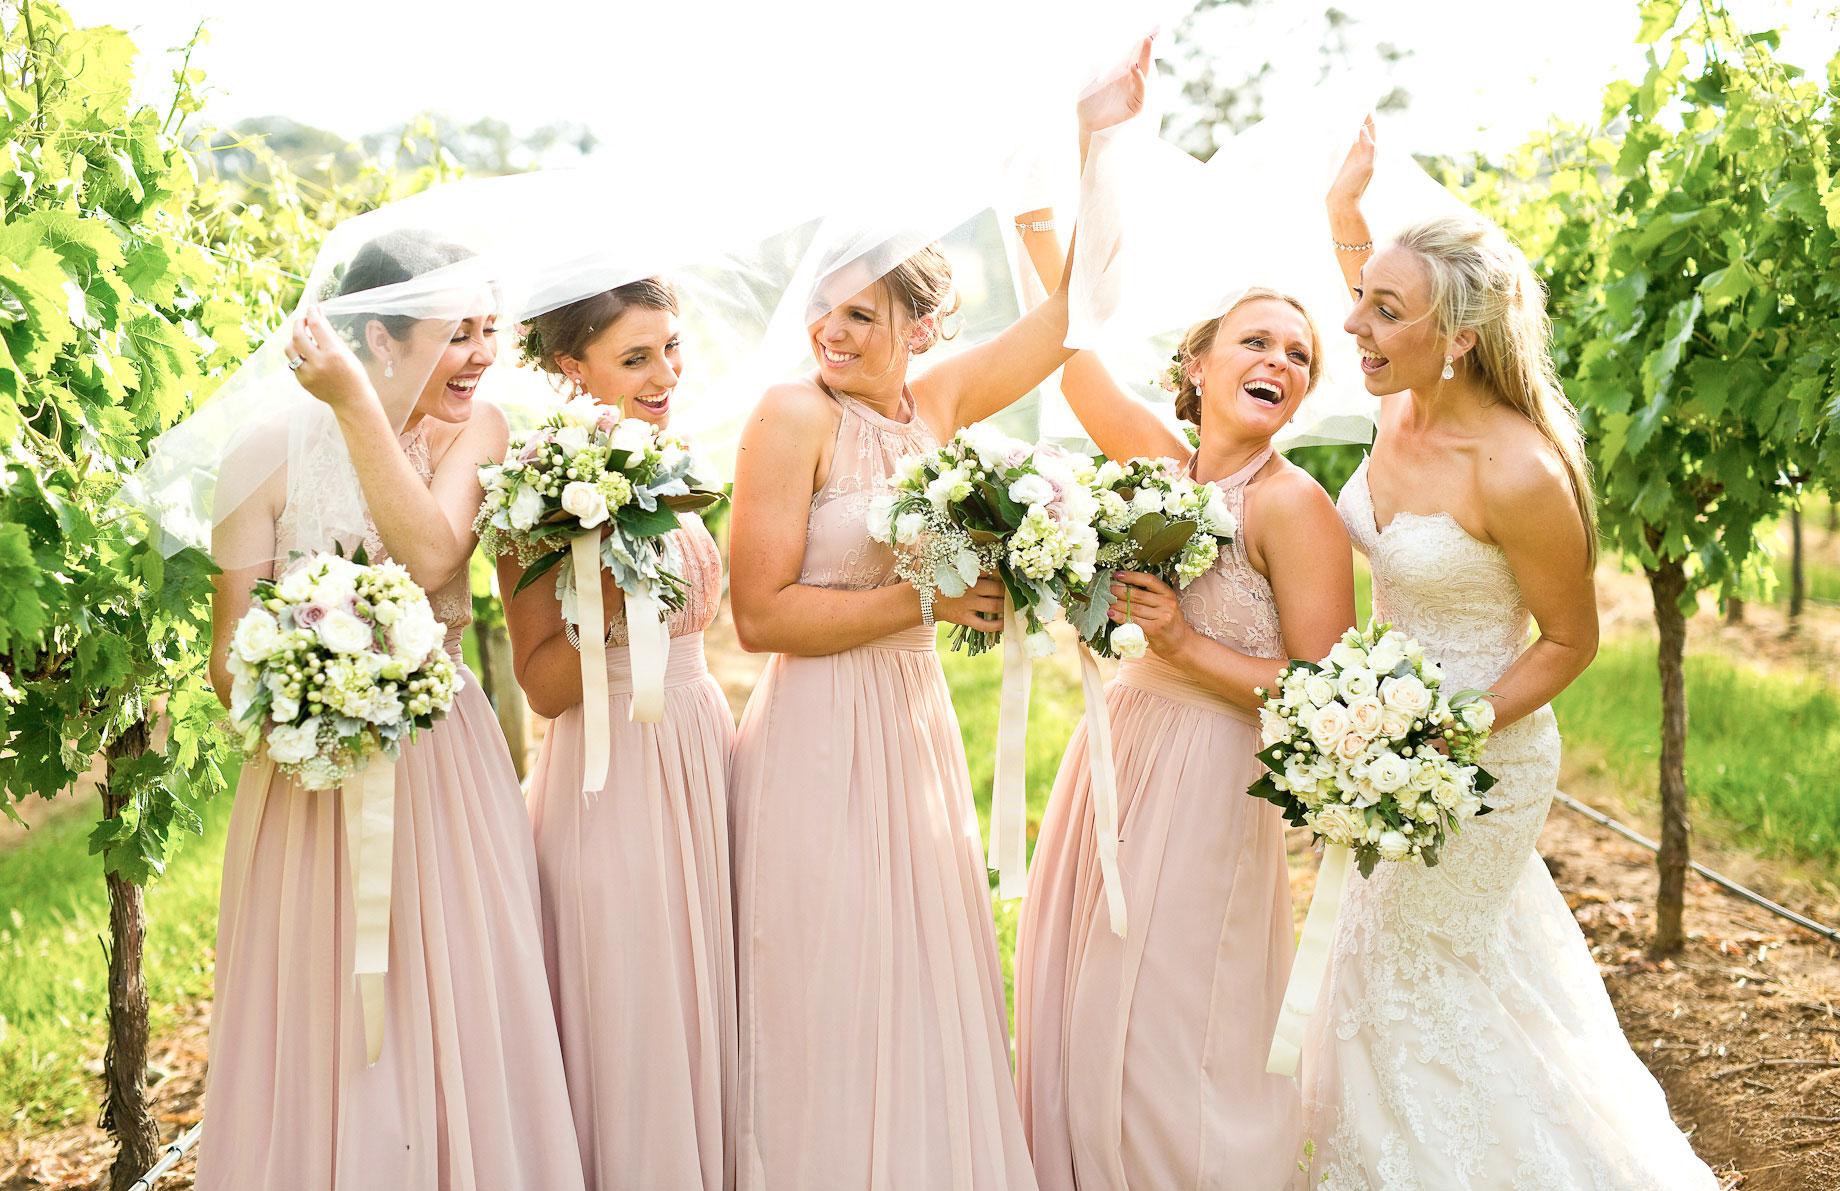 Centennial Vineyards wedding bridesmaids fun photo